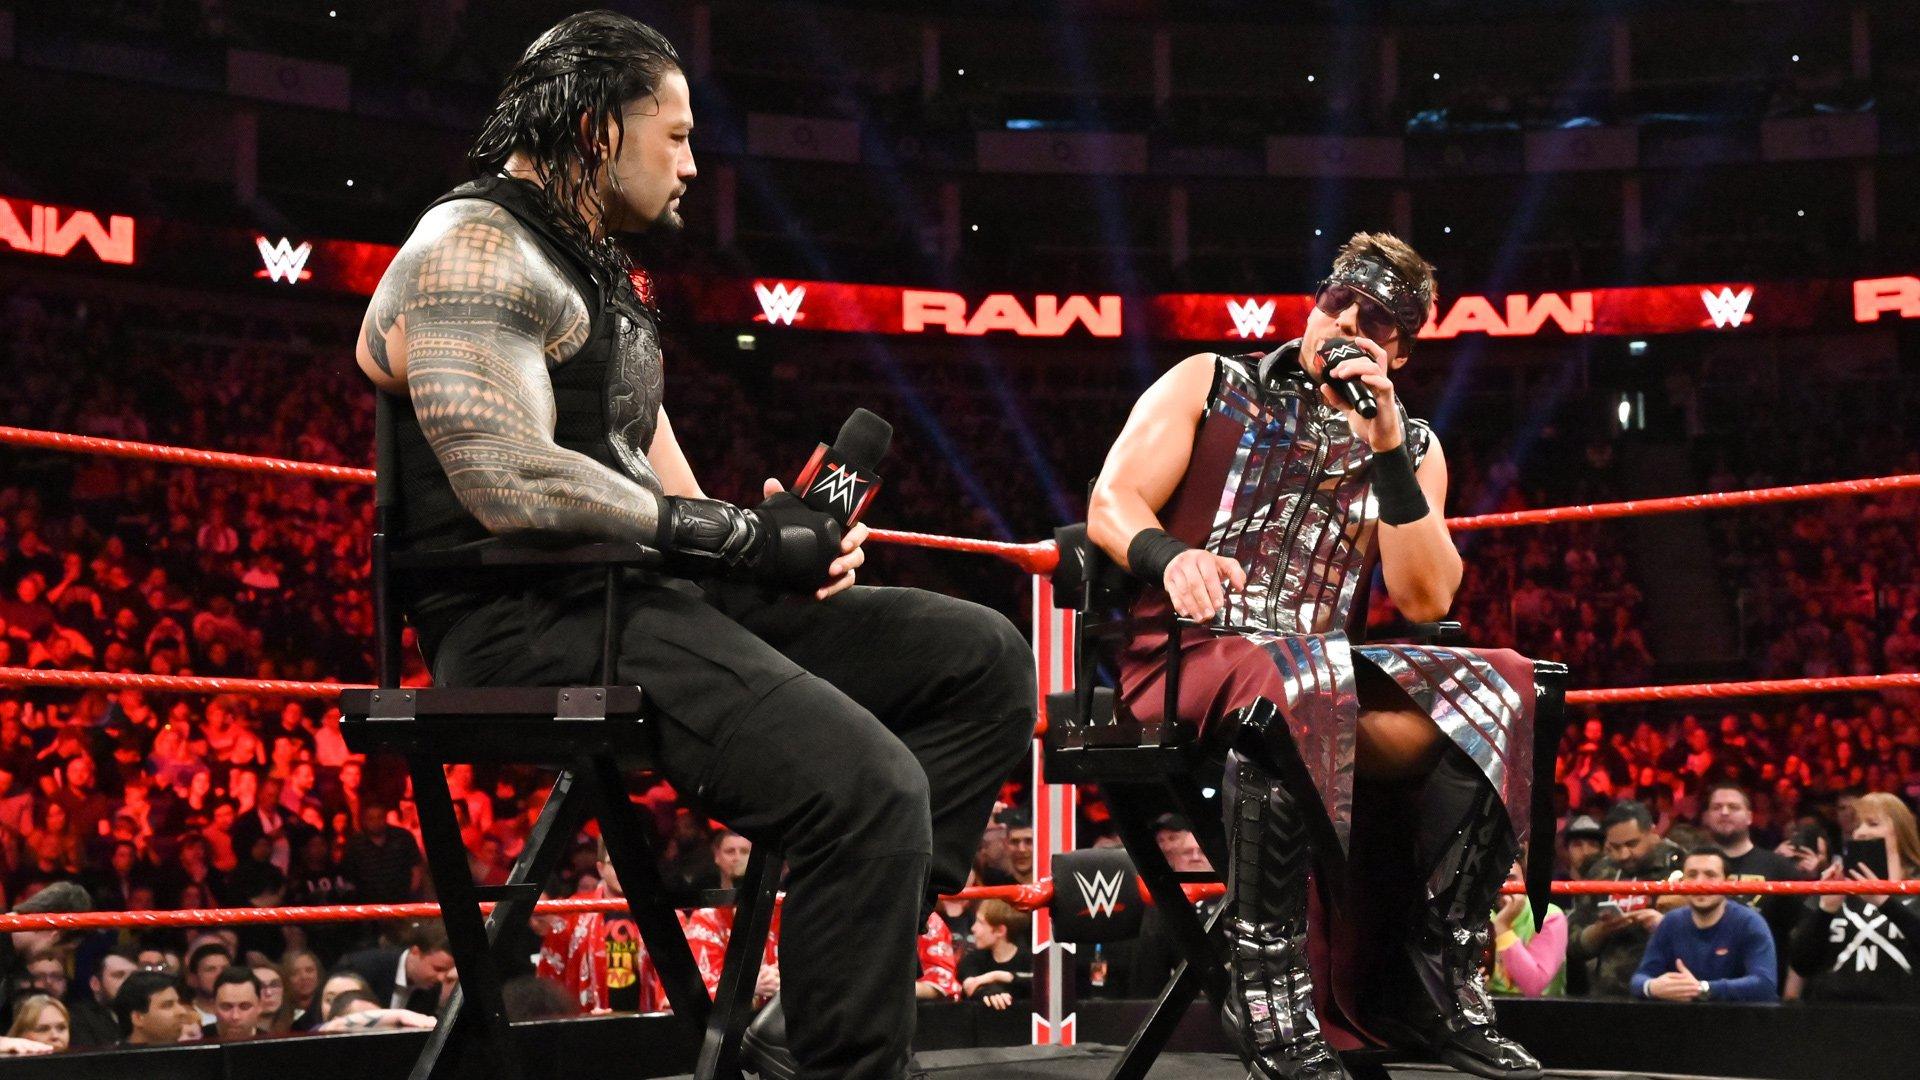 Resultado de imagen para Roman Reigns Sami zayn